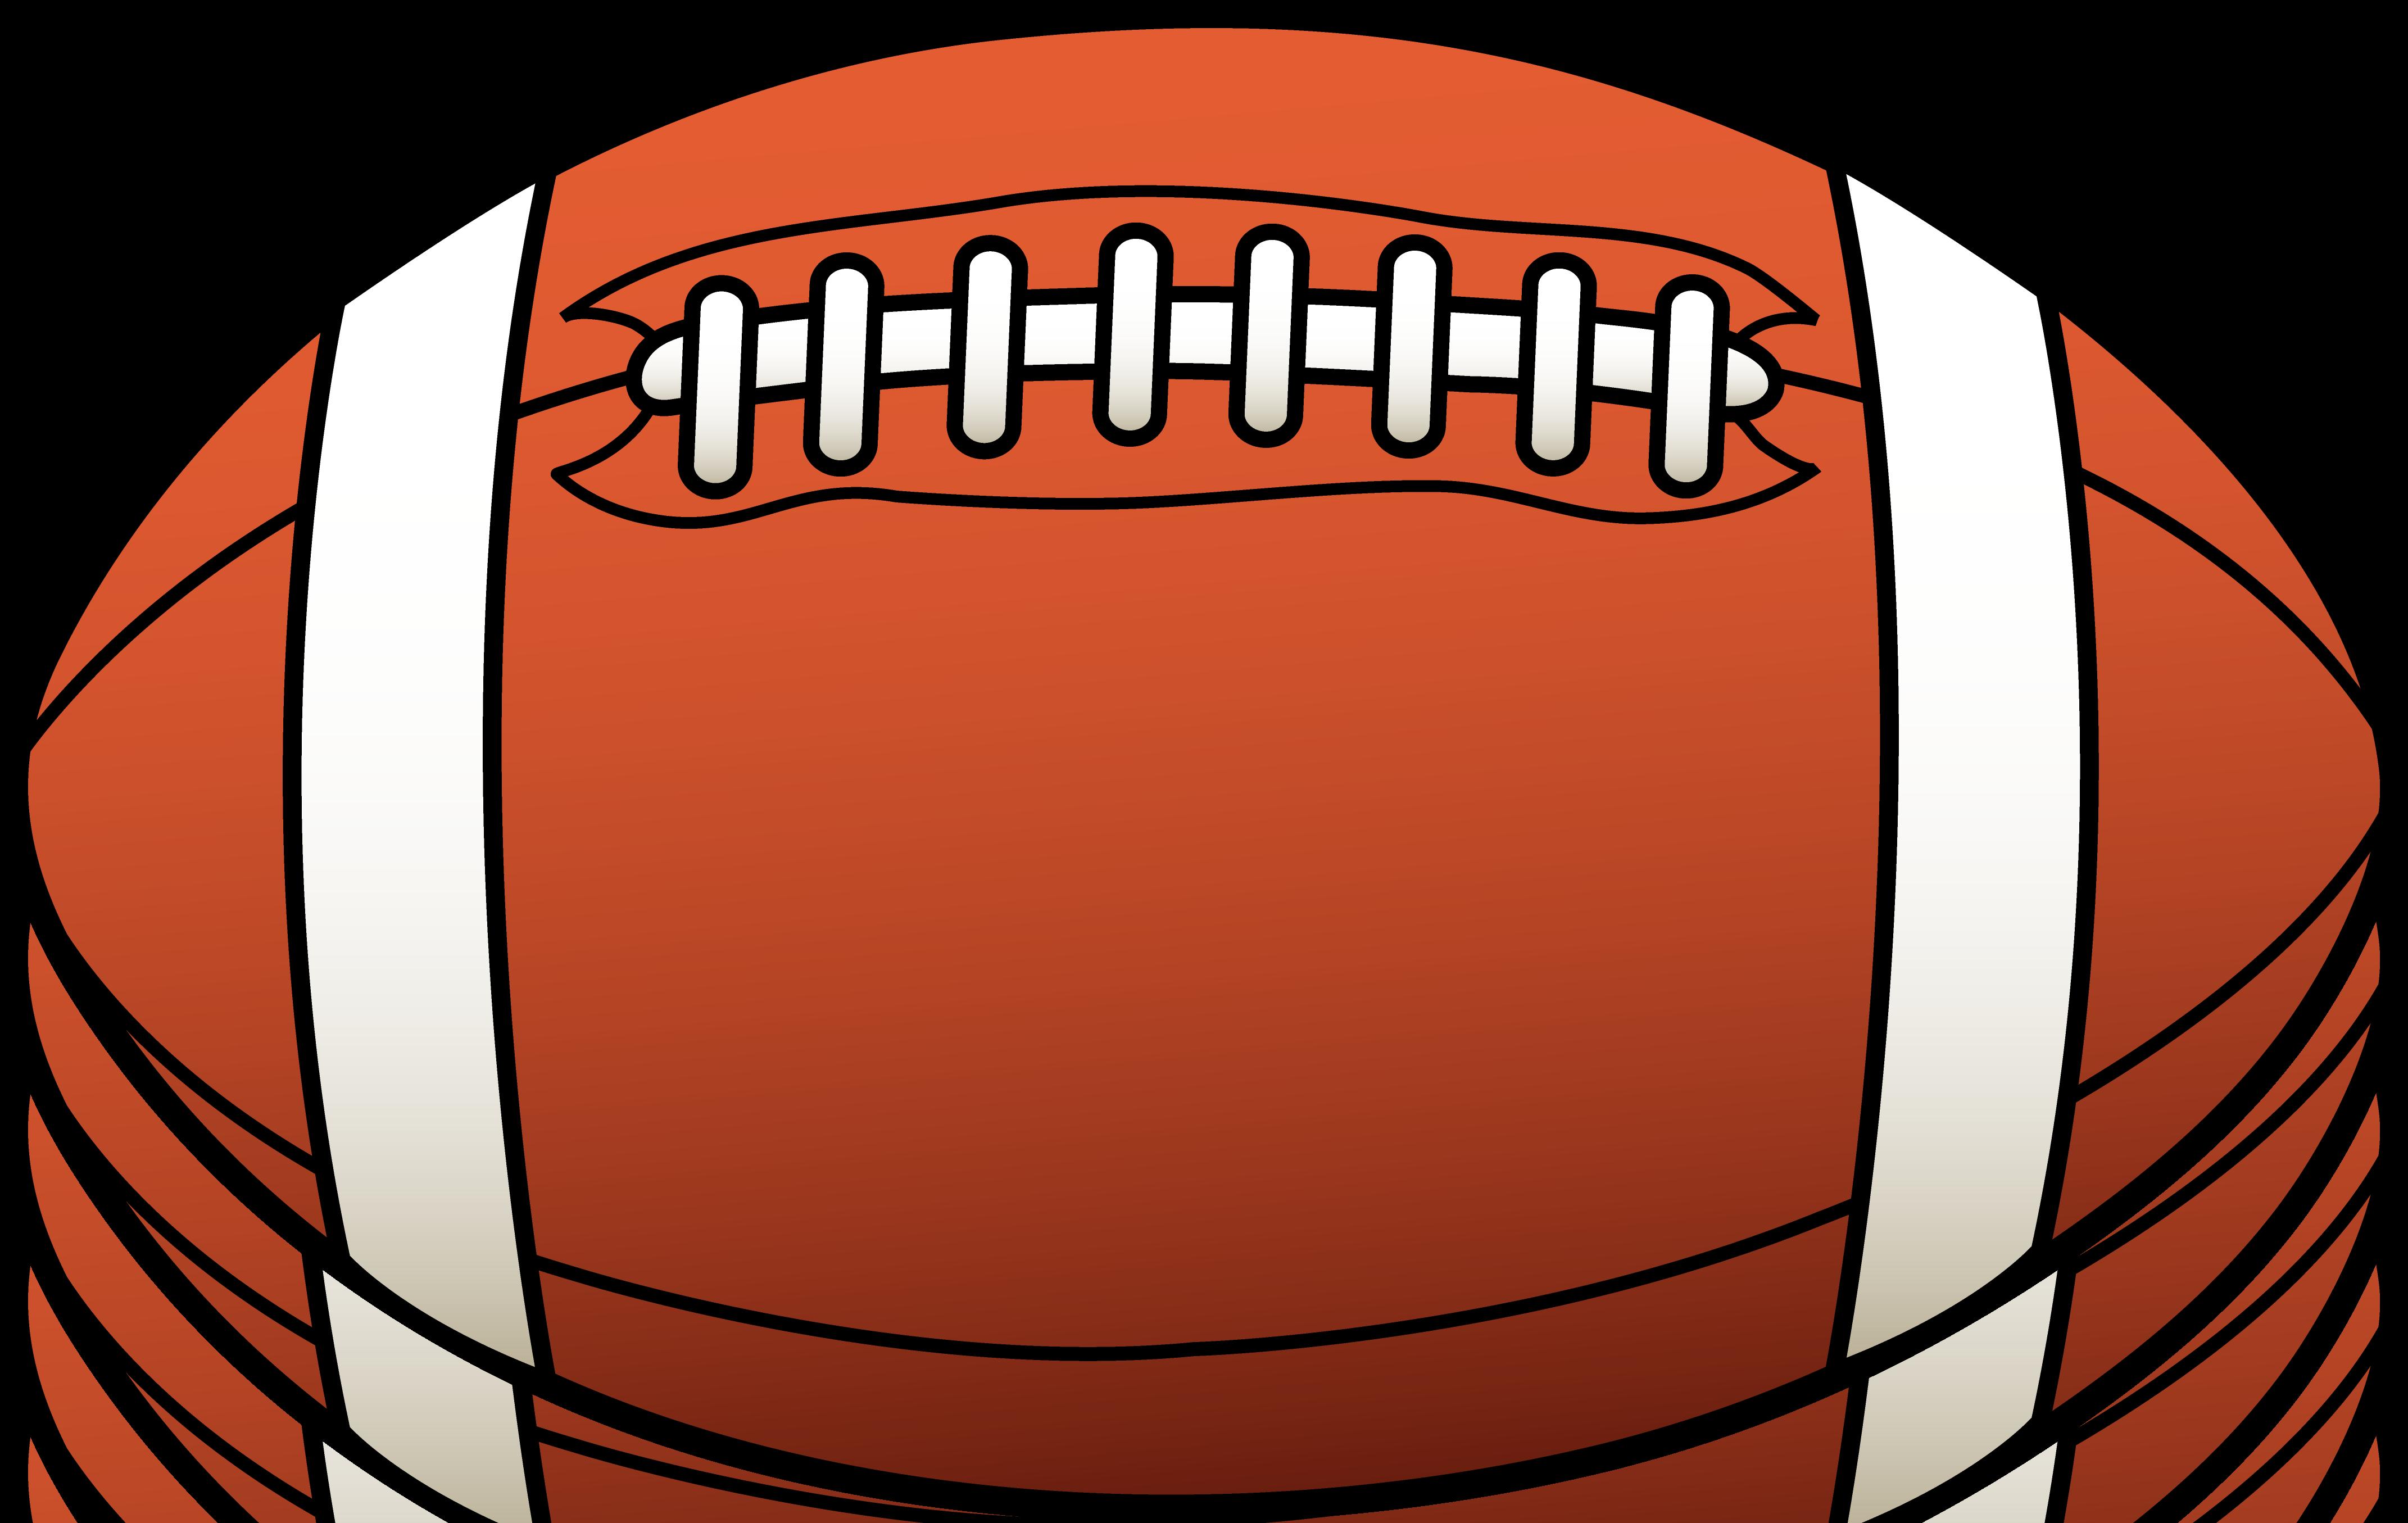 Football Clip Art · football clipart